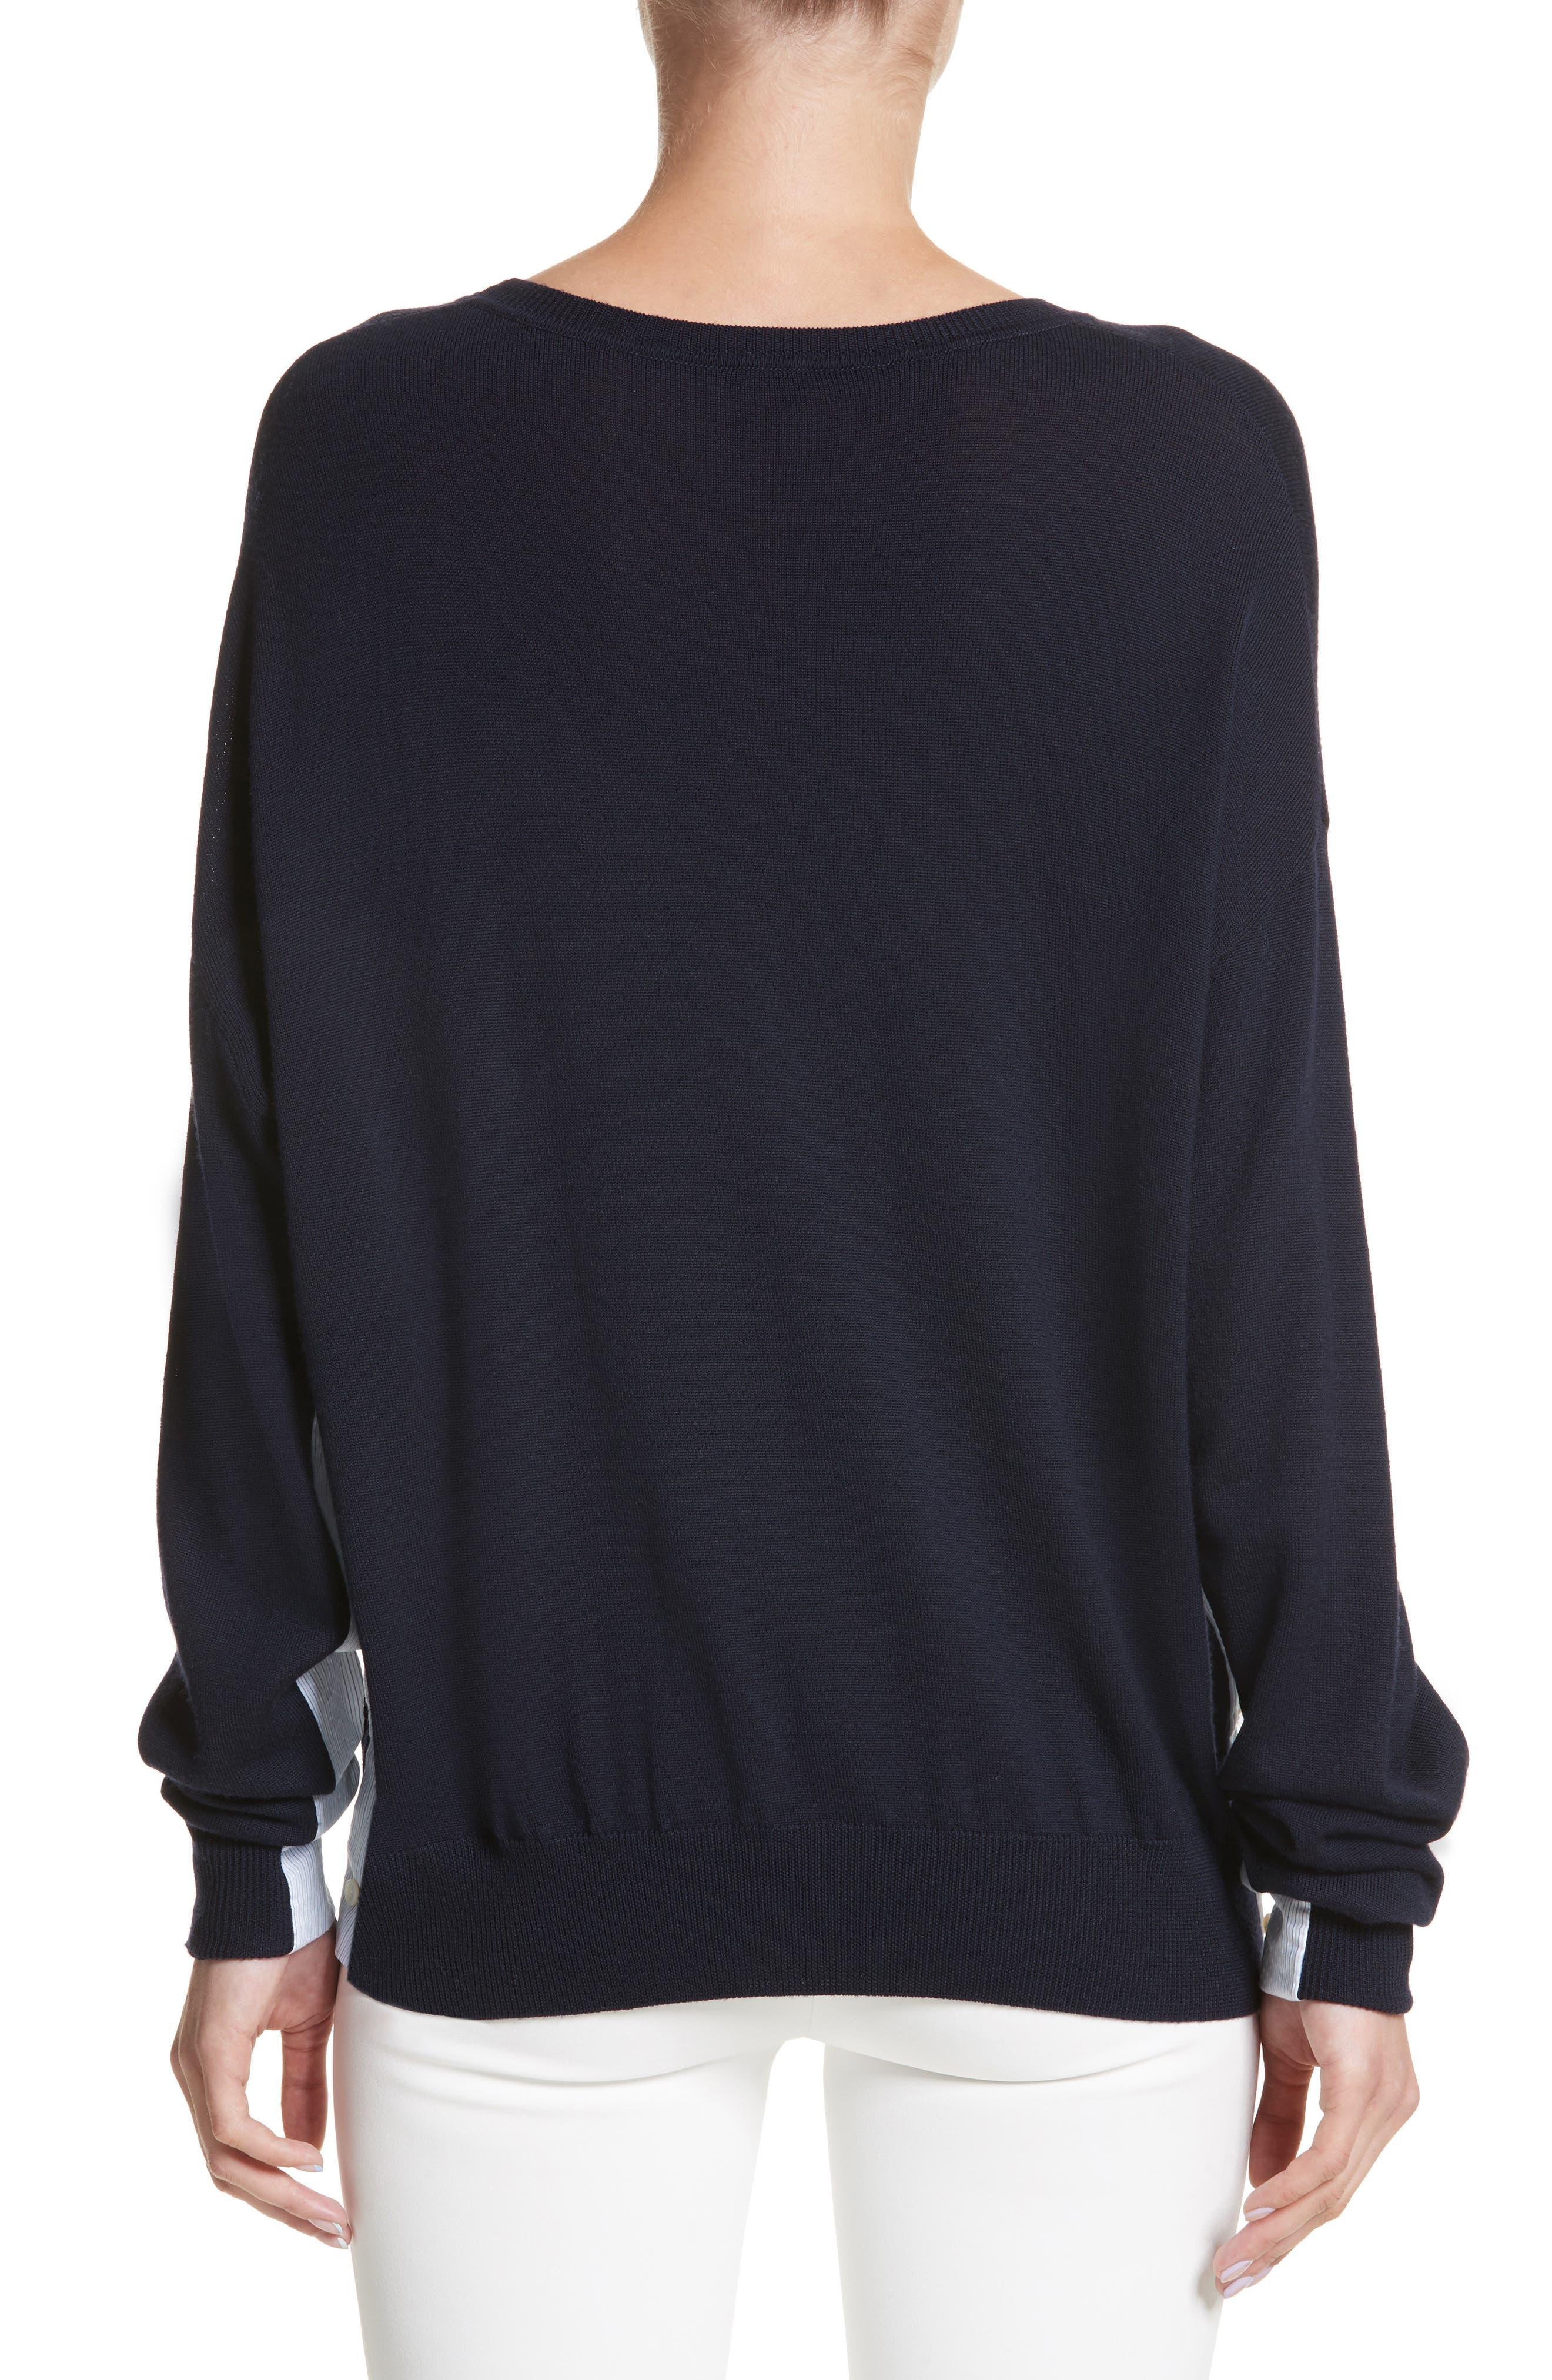 Alternate Image 2  - Adam Lippes Cotton Gusset Merino Wool Sweater